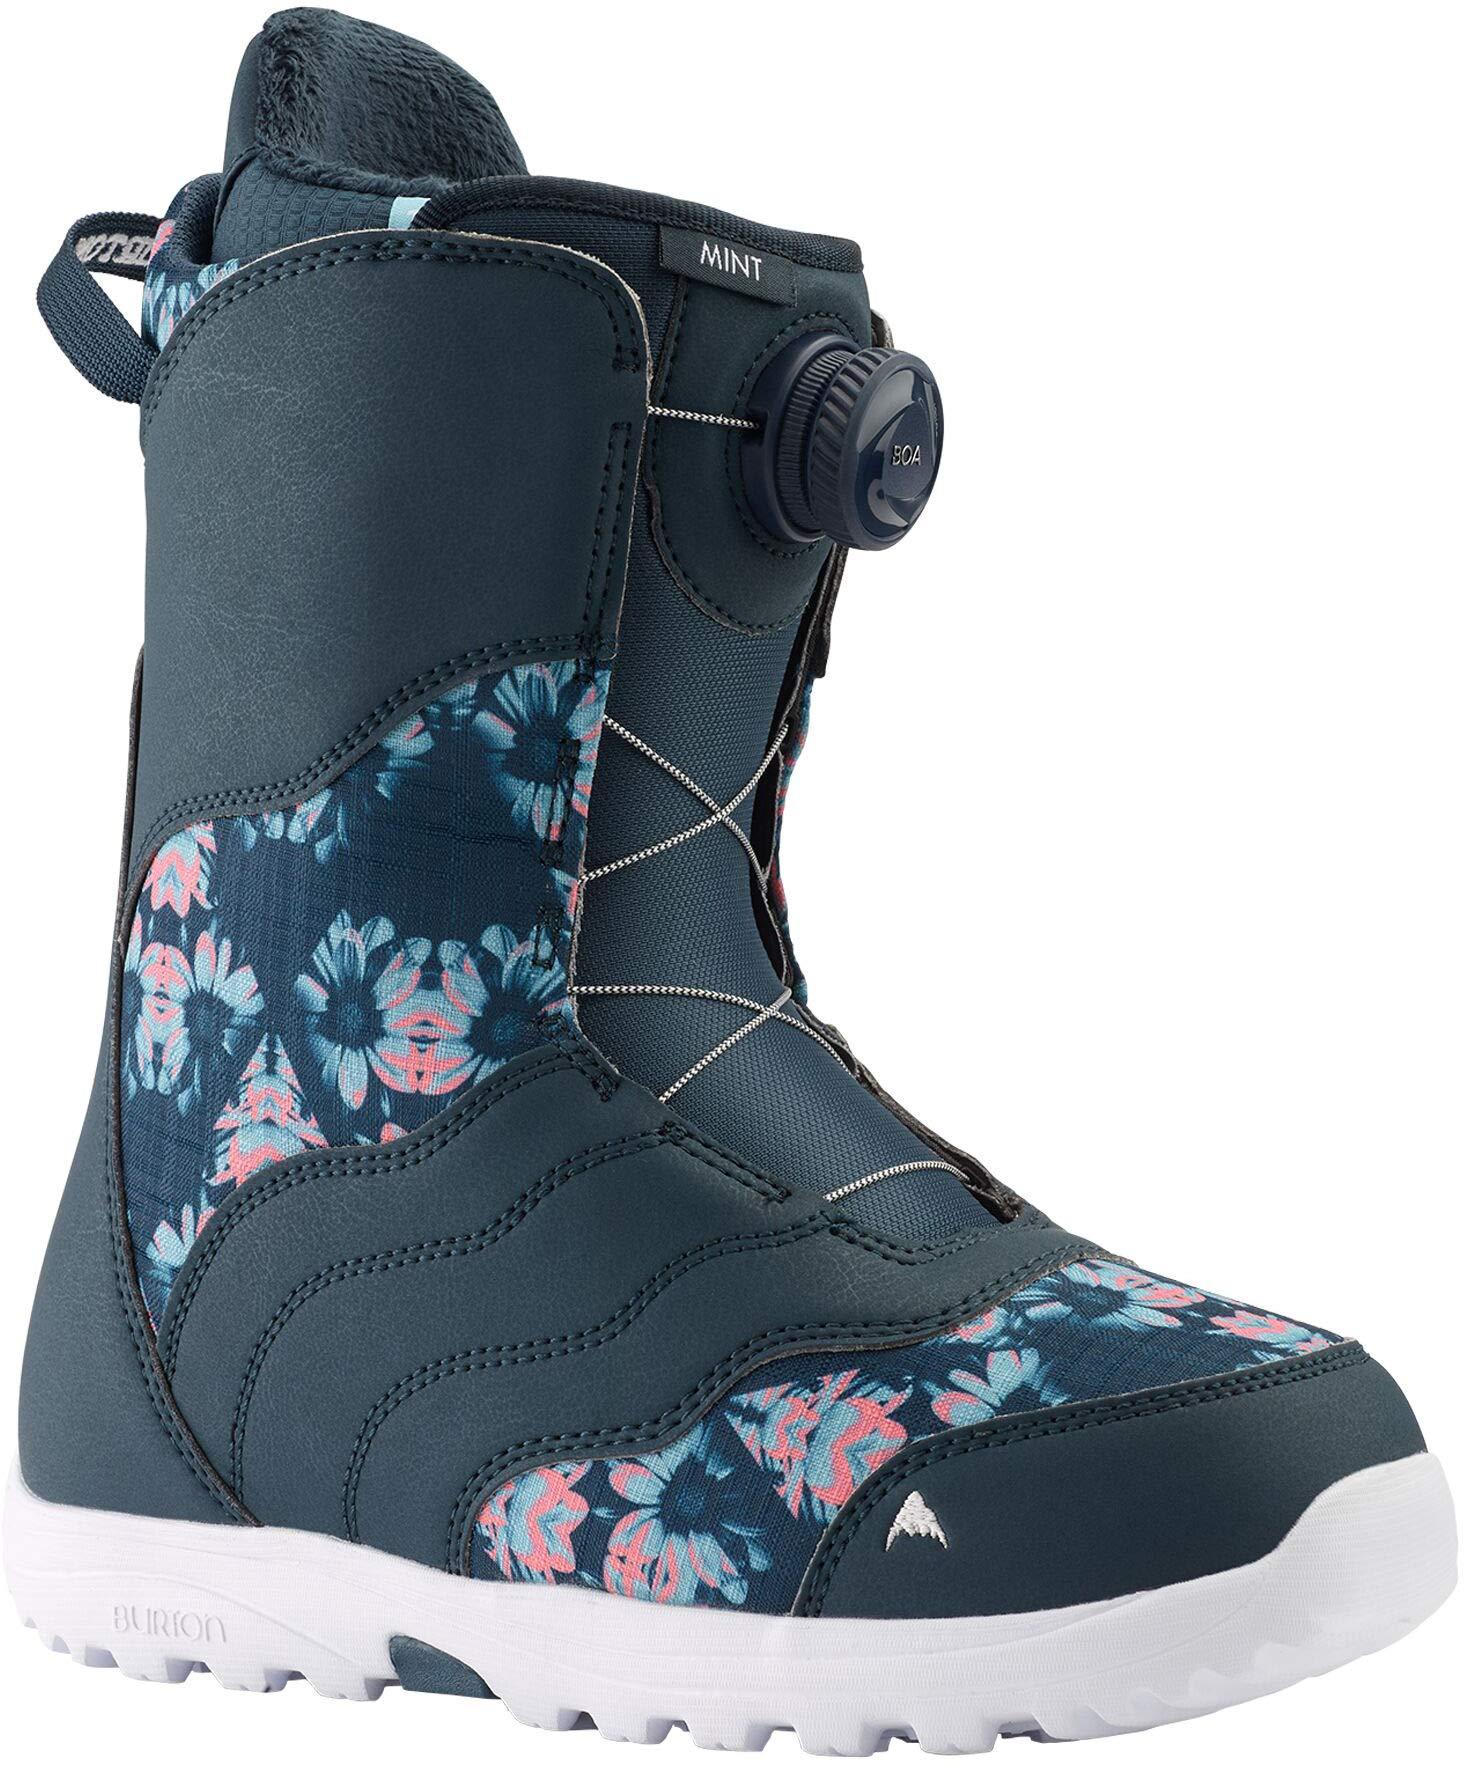 Burton Mint BOA Snowboard Boots Womens Sz 6.5 Midnite Blue/Multi by Burton